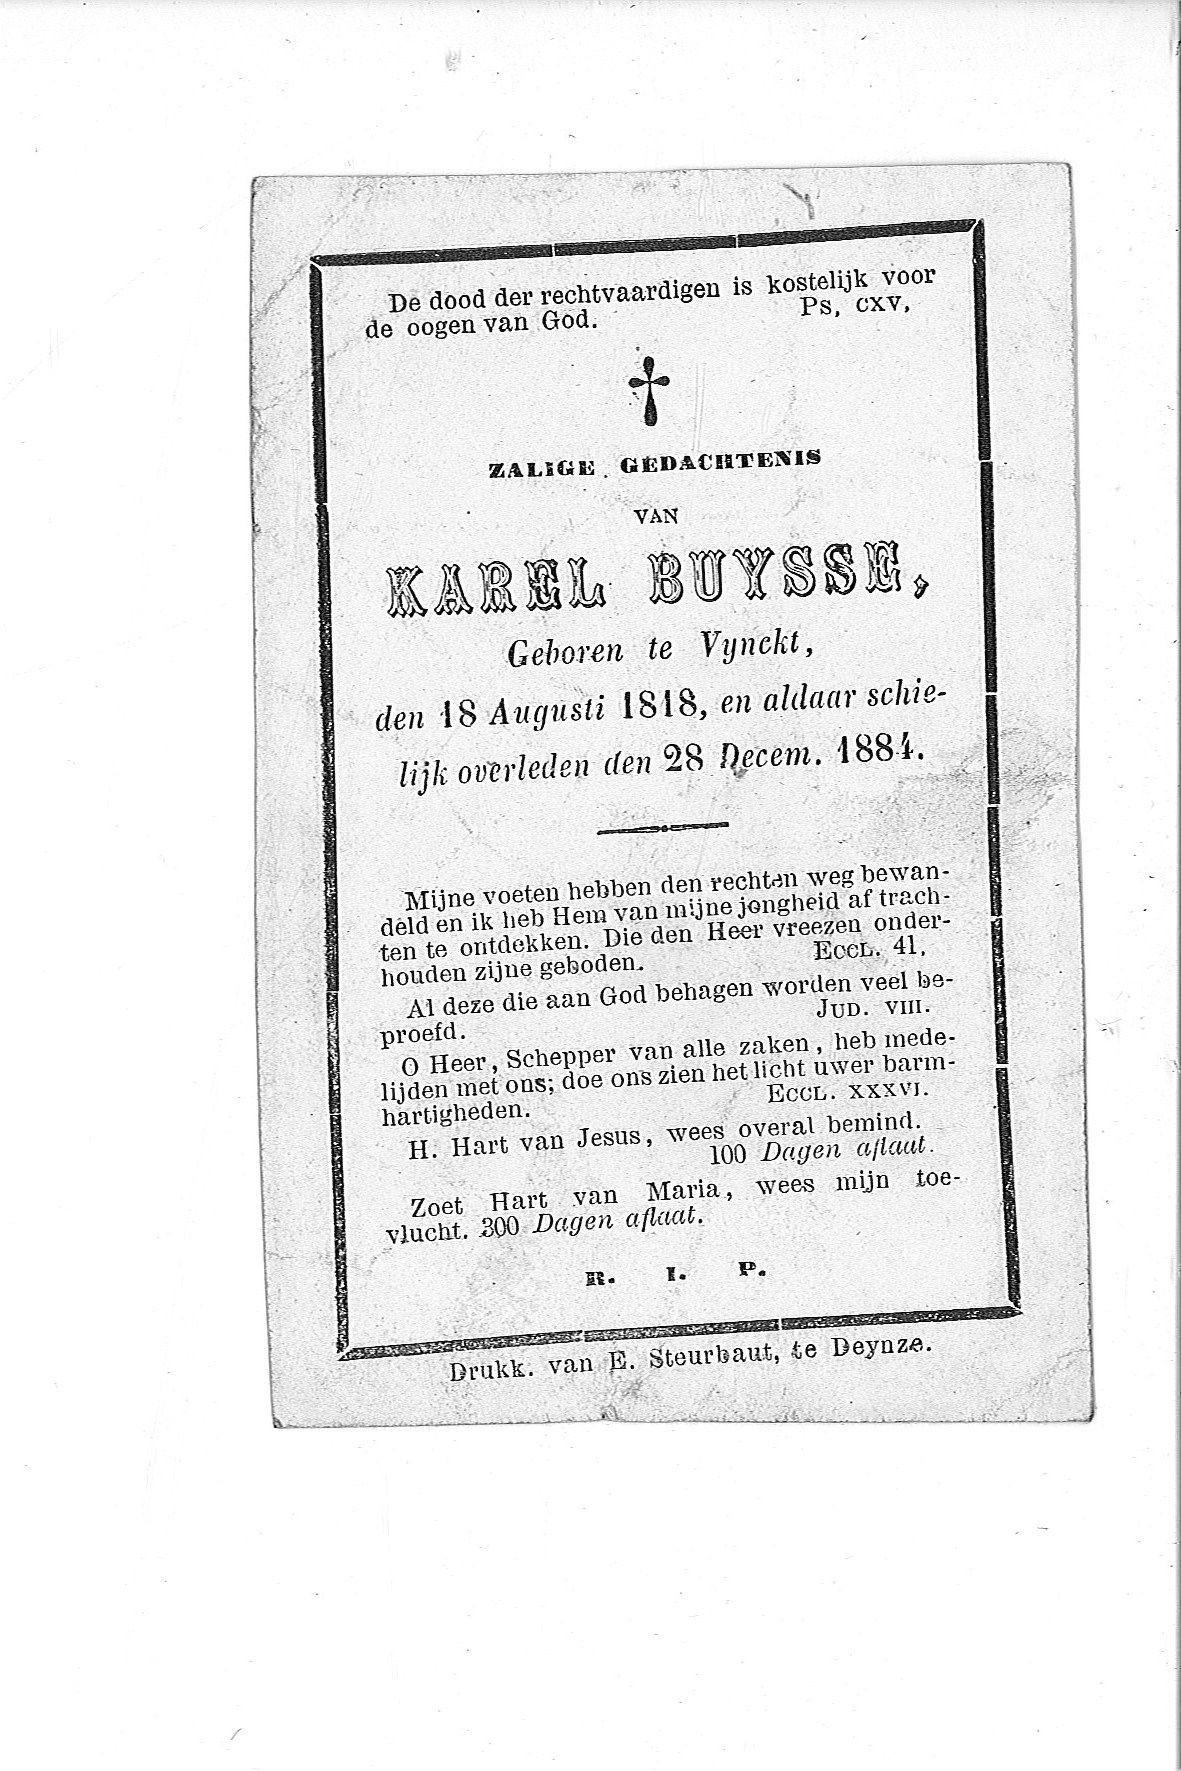 Karel20090515105126_00005 (2).jpg